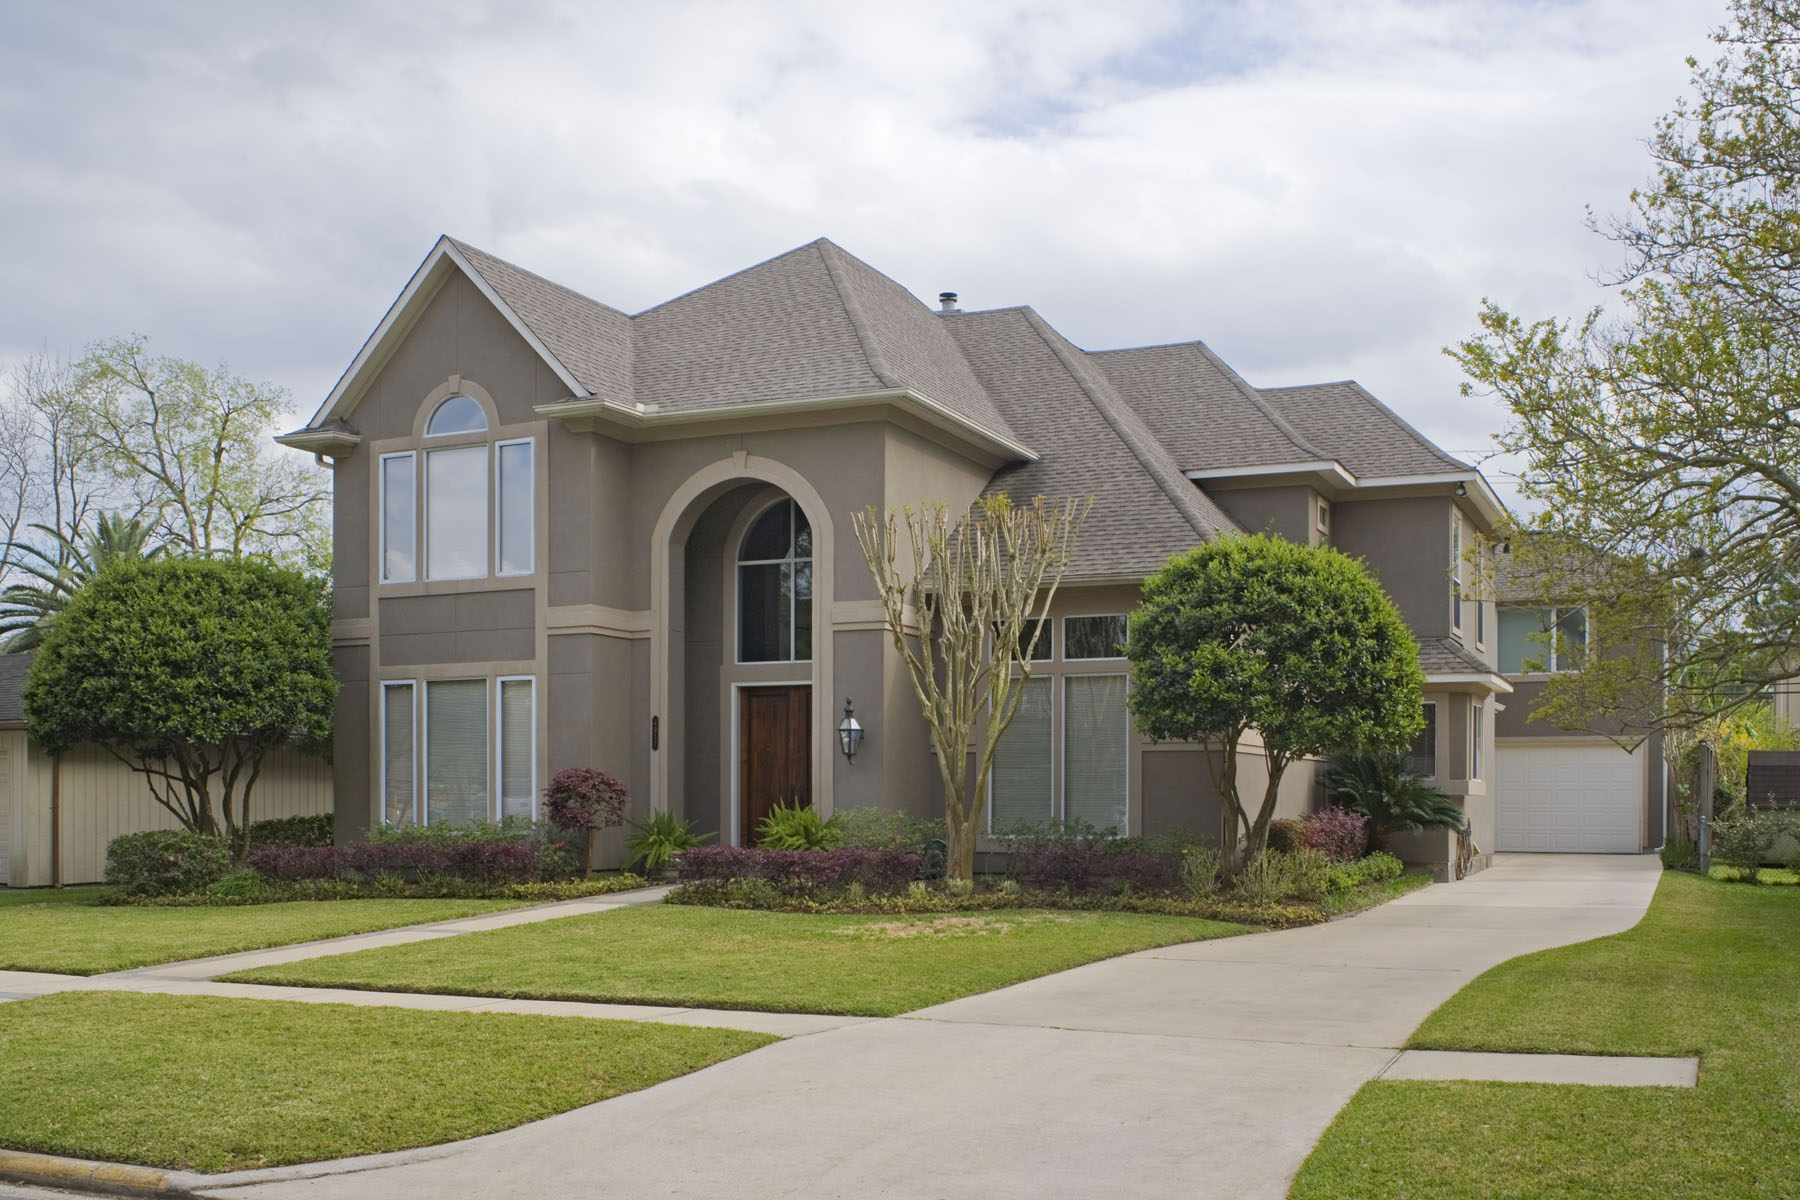 garage sale marketing ideas - Houston Real Estate Blog Open Houses